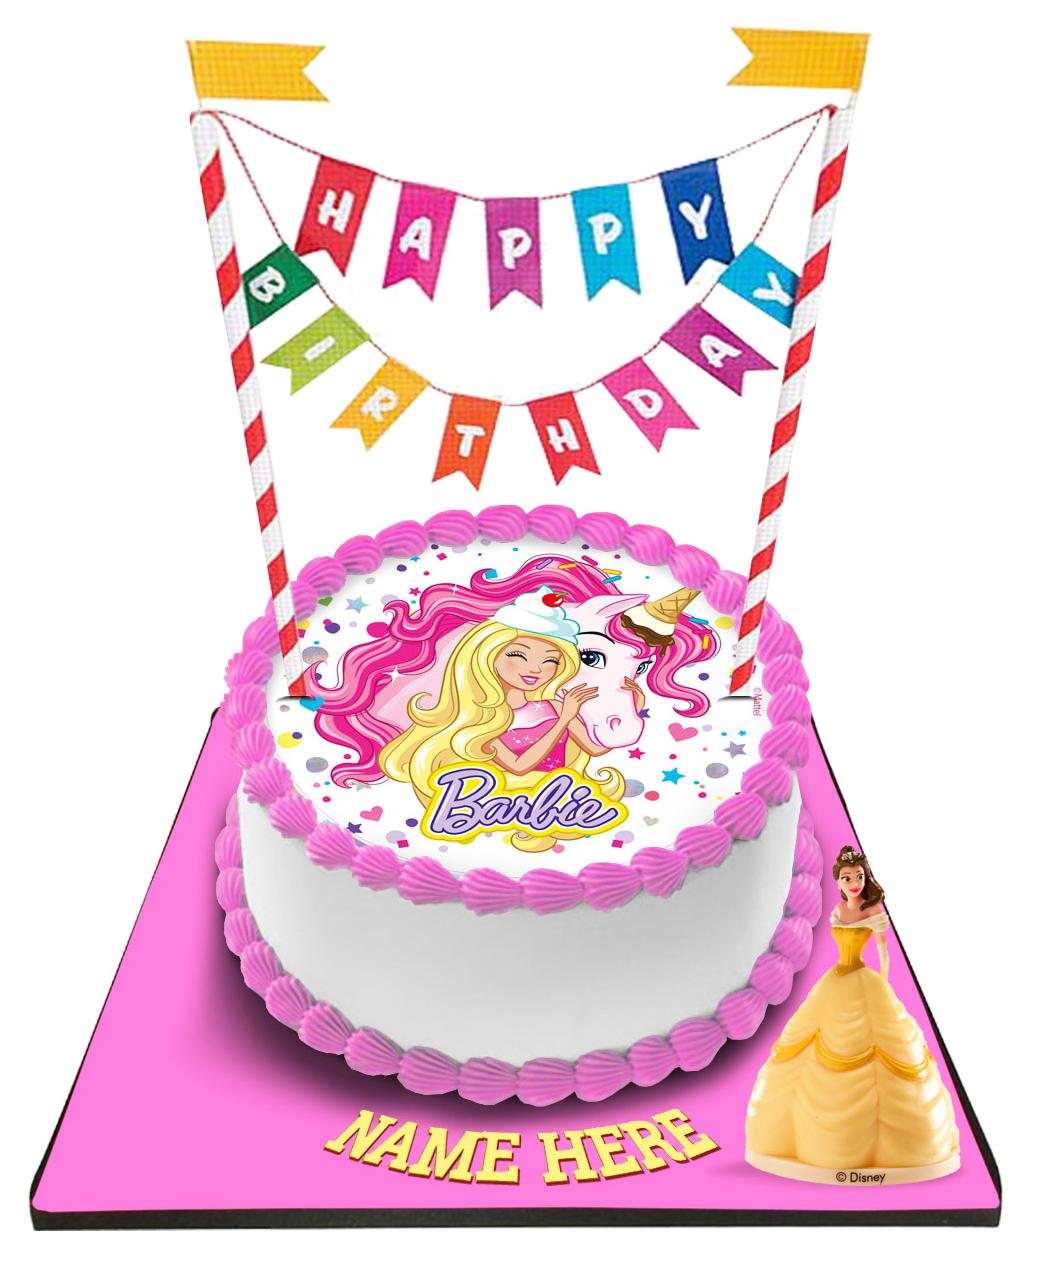 Tremendous Barbie Cake With Happy Birthday Bunting Topper Personalised Birthday Cards Beptaeletsinfo